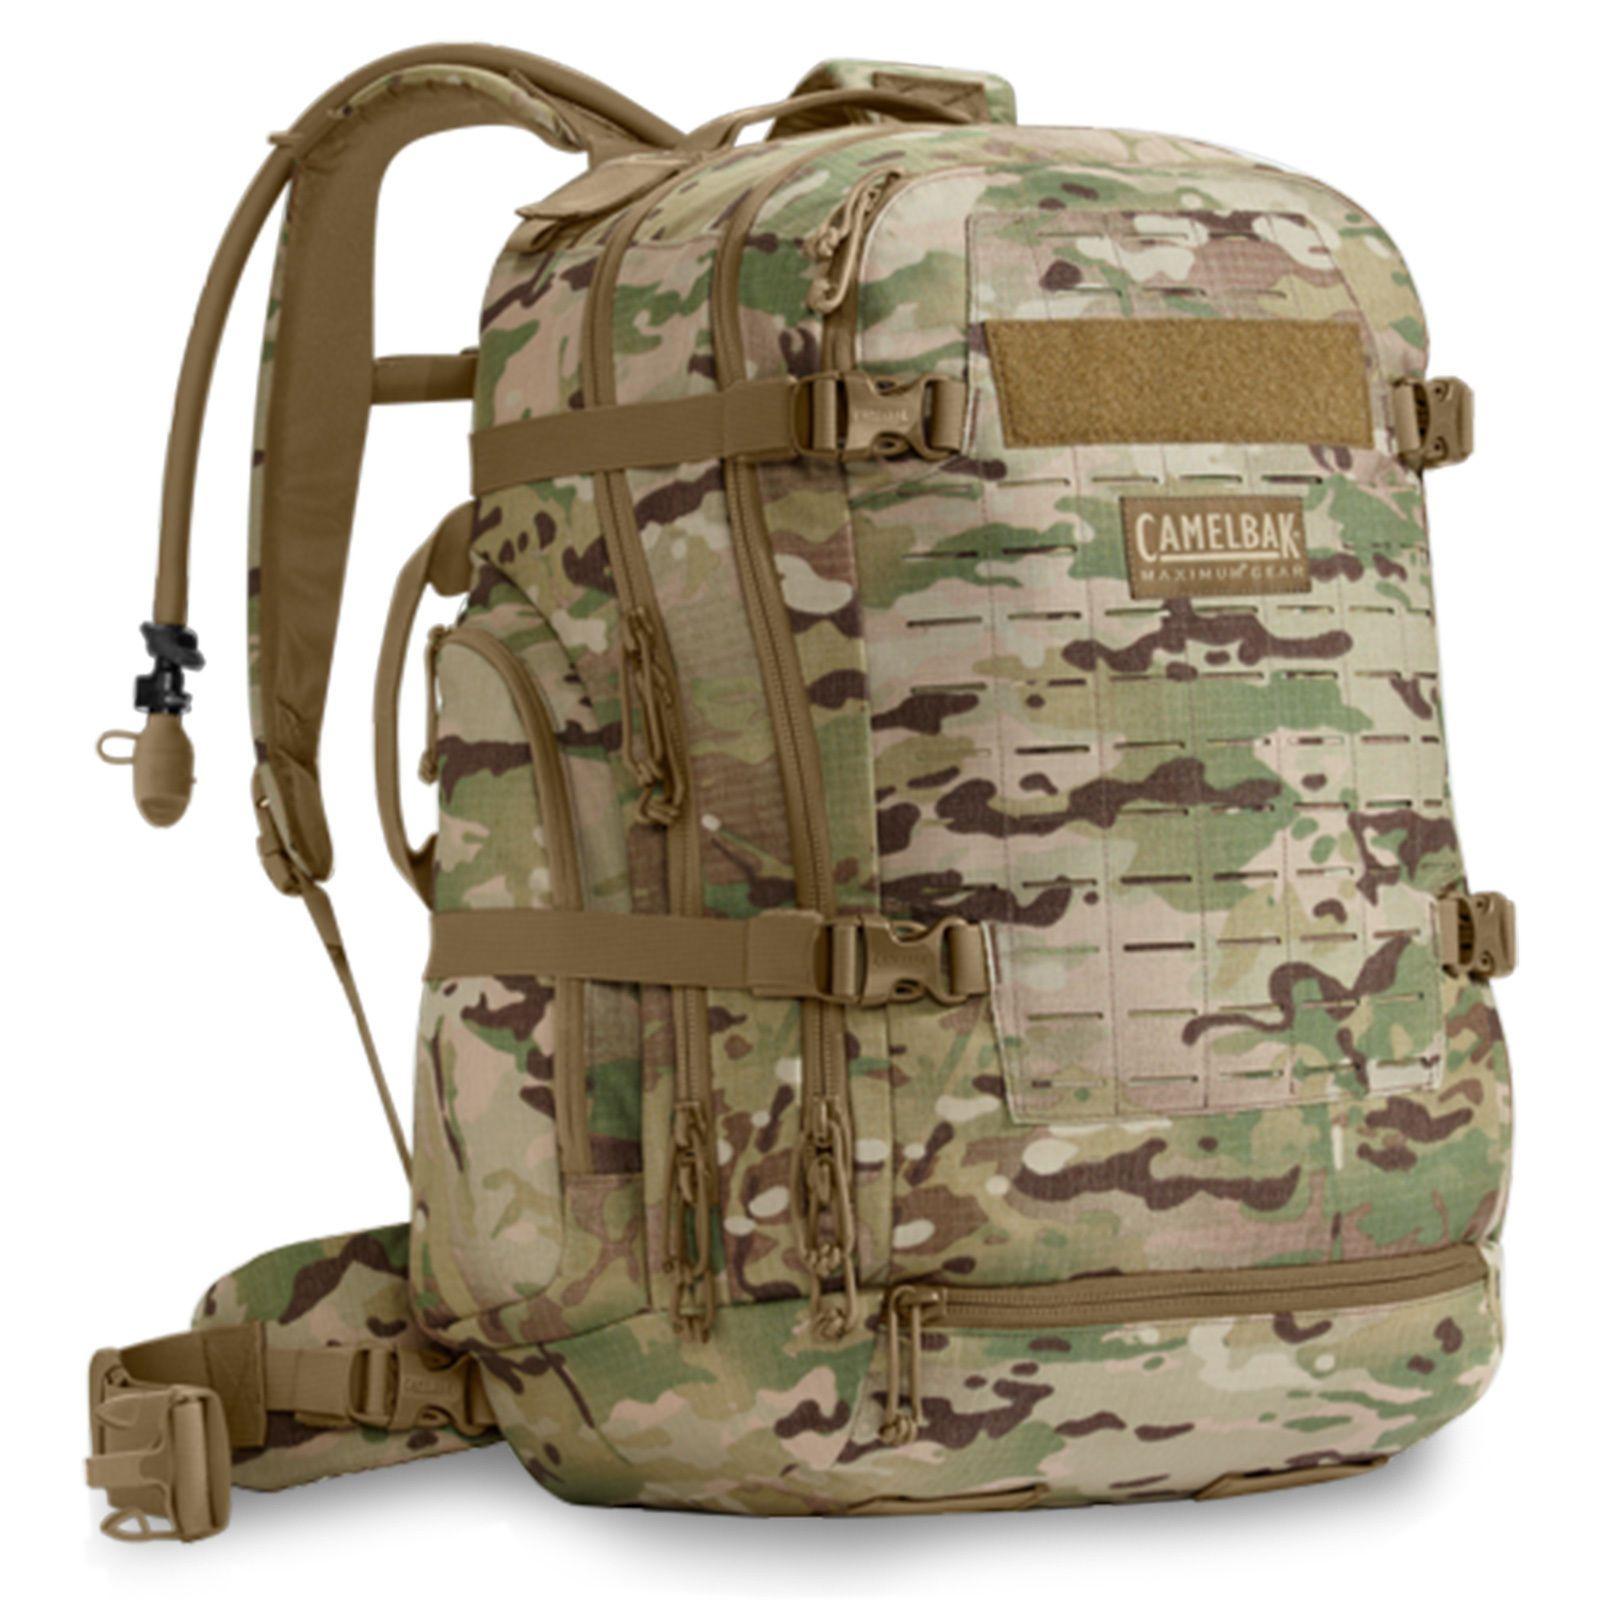 e6c00e836bf3 Camelbak Rubicon Military Army Hydration Rucksack Daysack Pack Multicam MTP  NEW